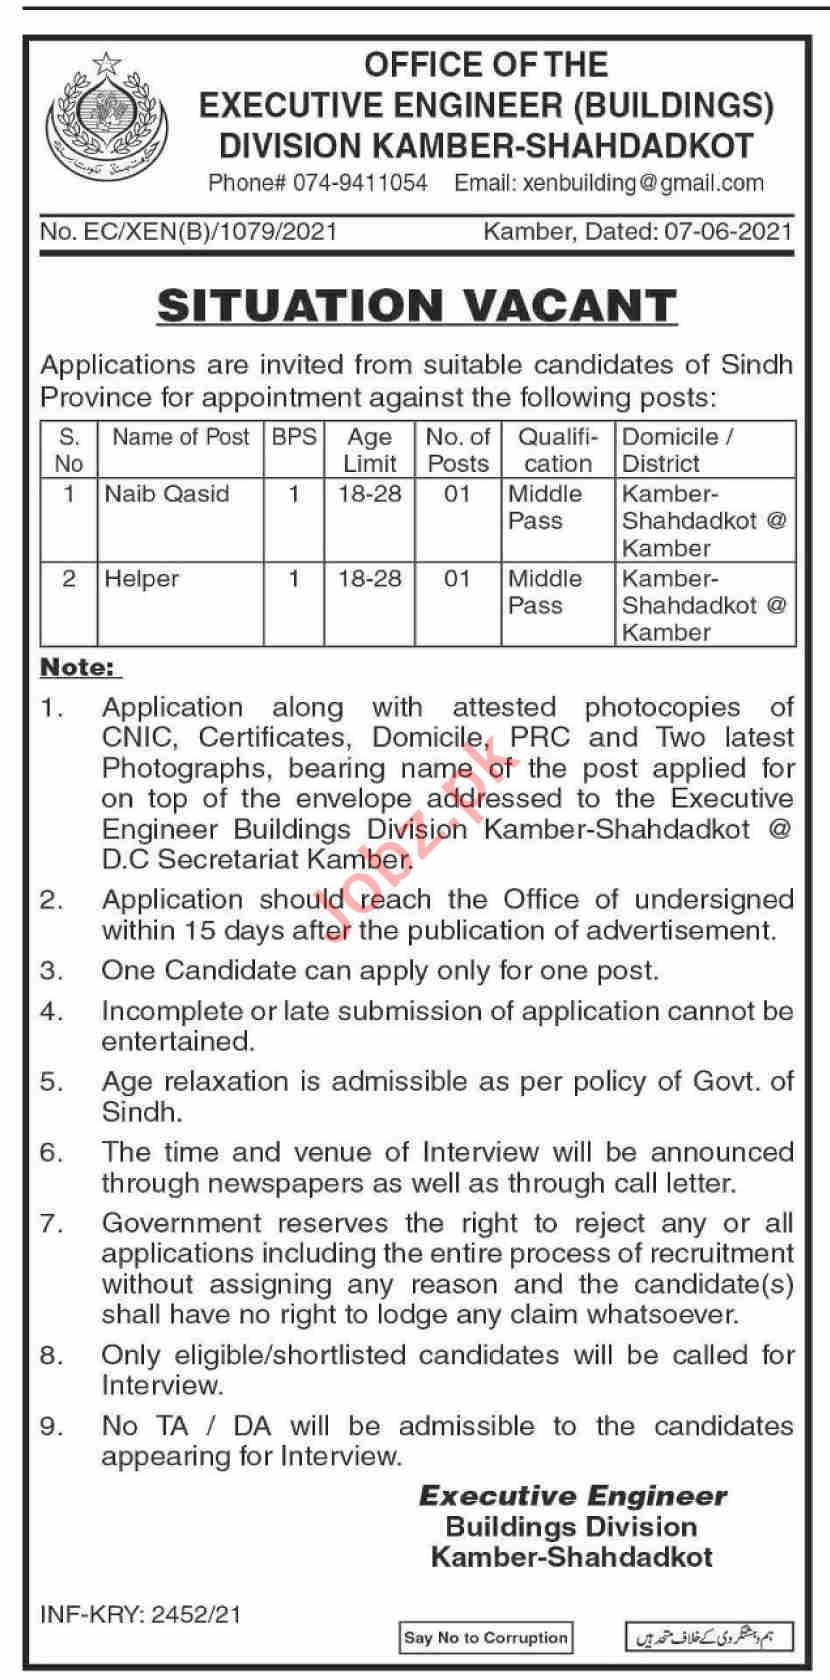 Buildings Division Kamber Shahdadkot Jobs 2021 Naib Qasid